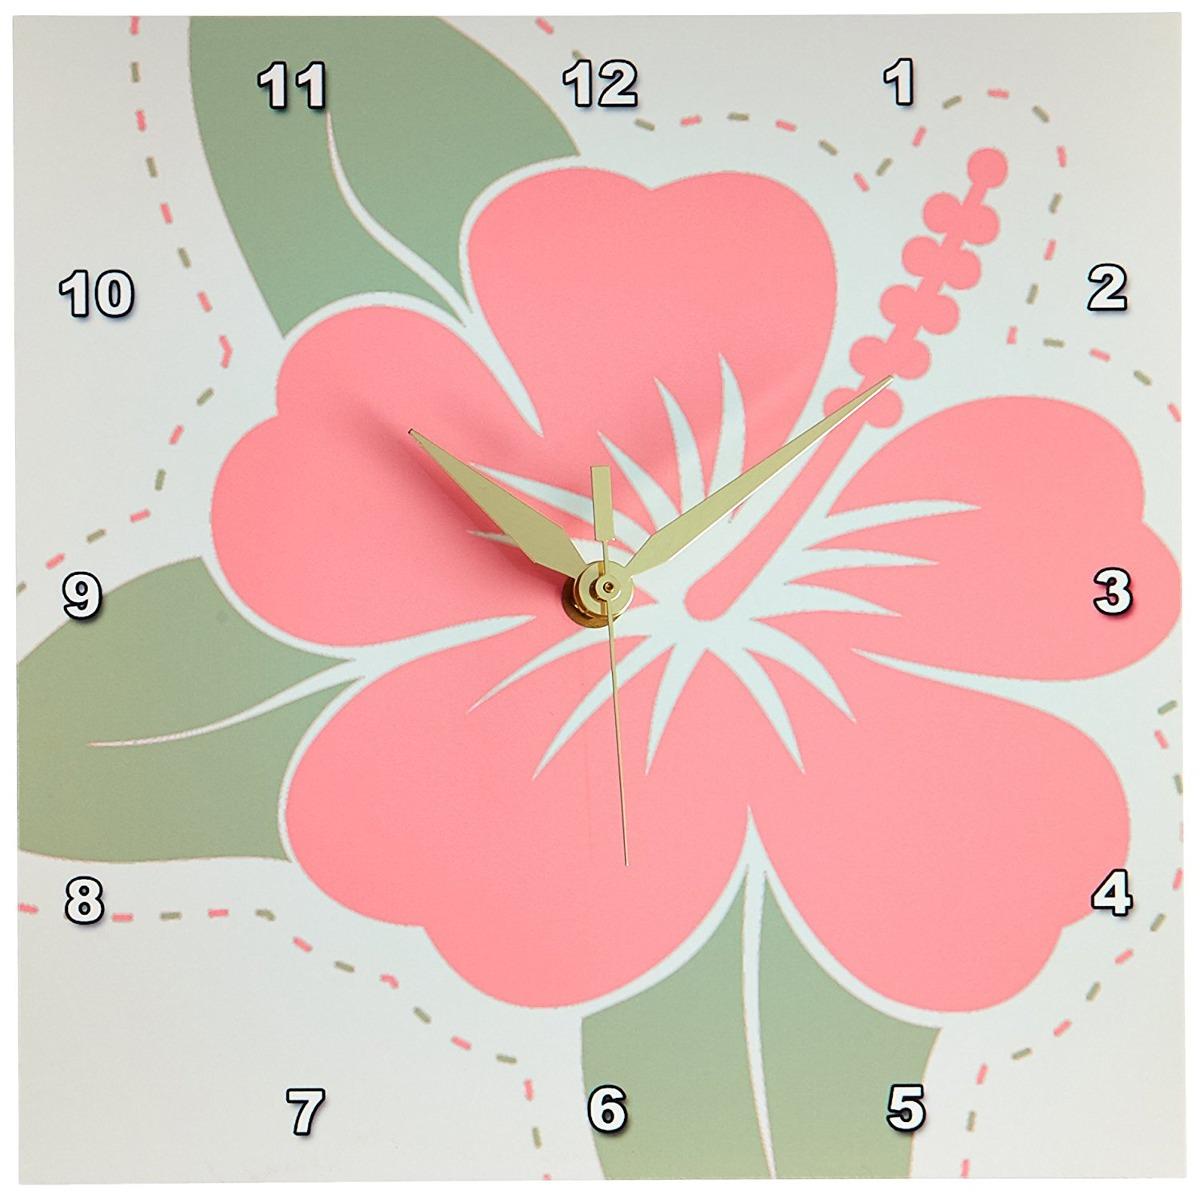 3drose Dpp443301 Pink Hawaiian Flowers On A Light Gray Bac